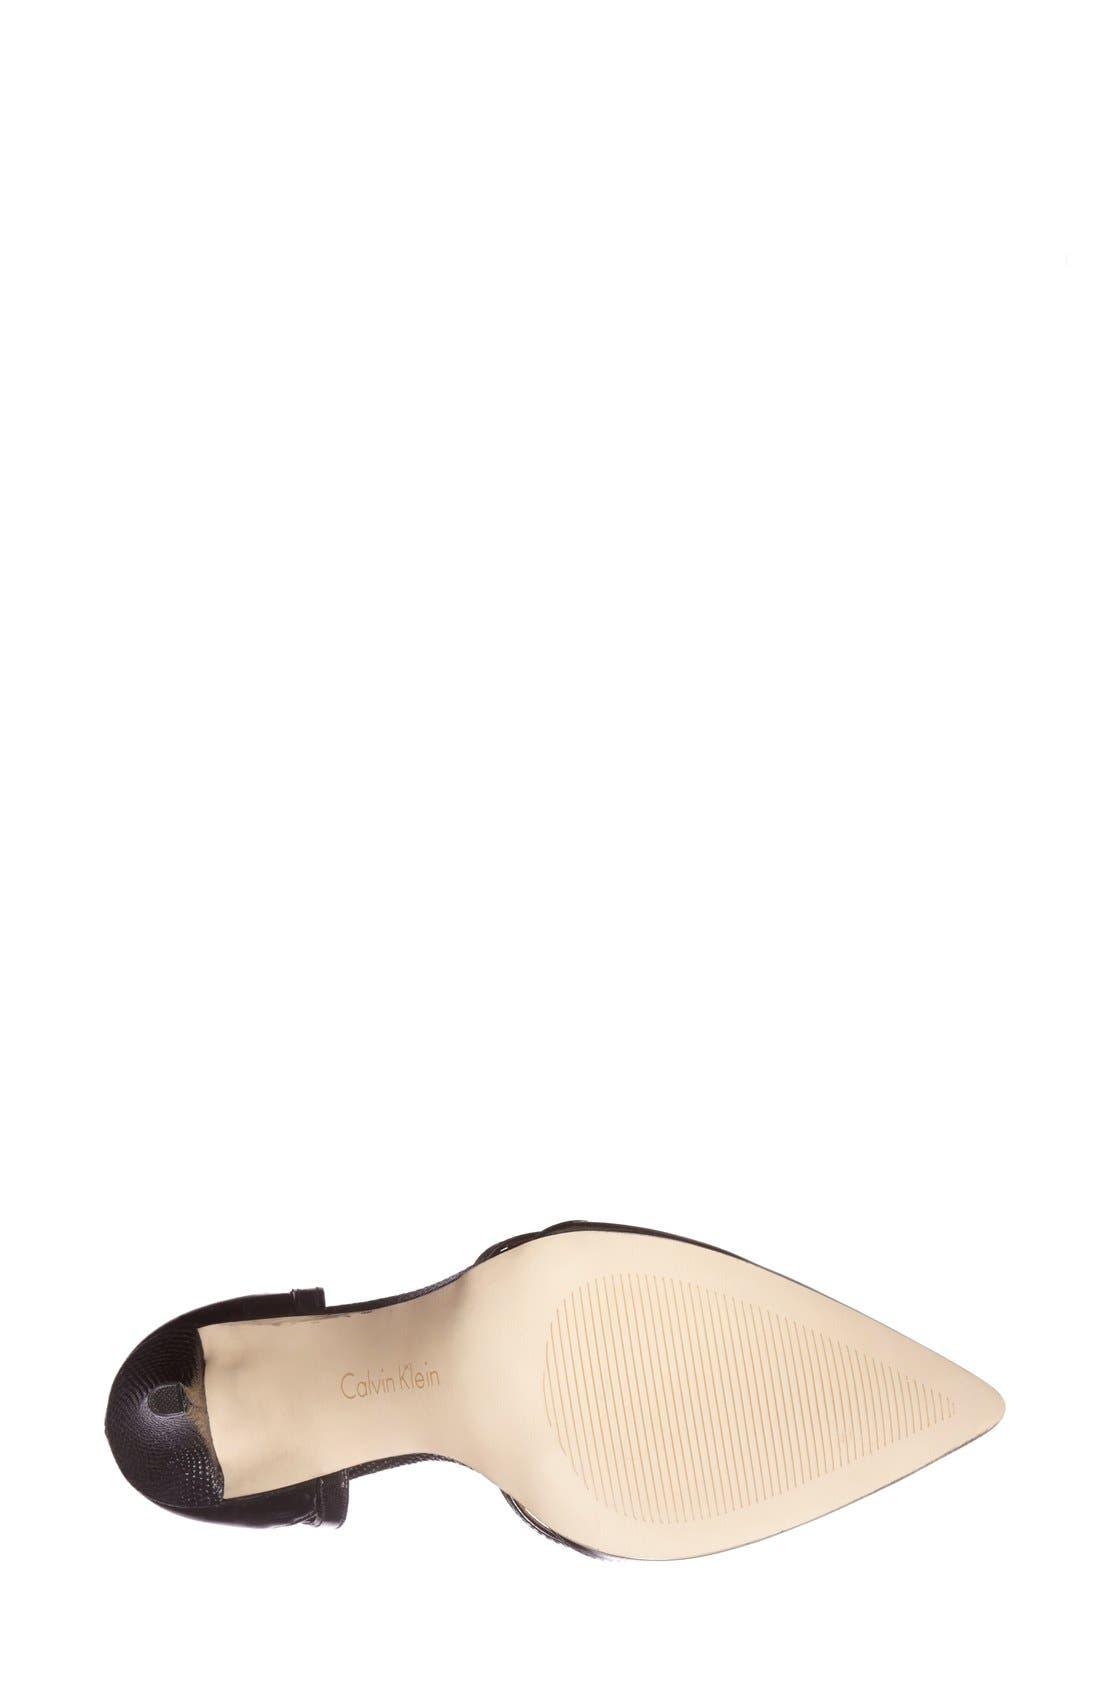 CALVIN KLEIN, 'Gilia' Cutout Leather d'Orsay Pump, Alternate thumbnail 3, color, 001